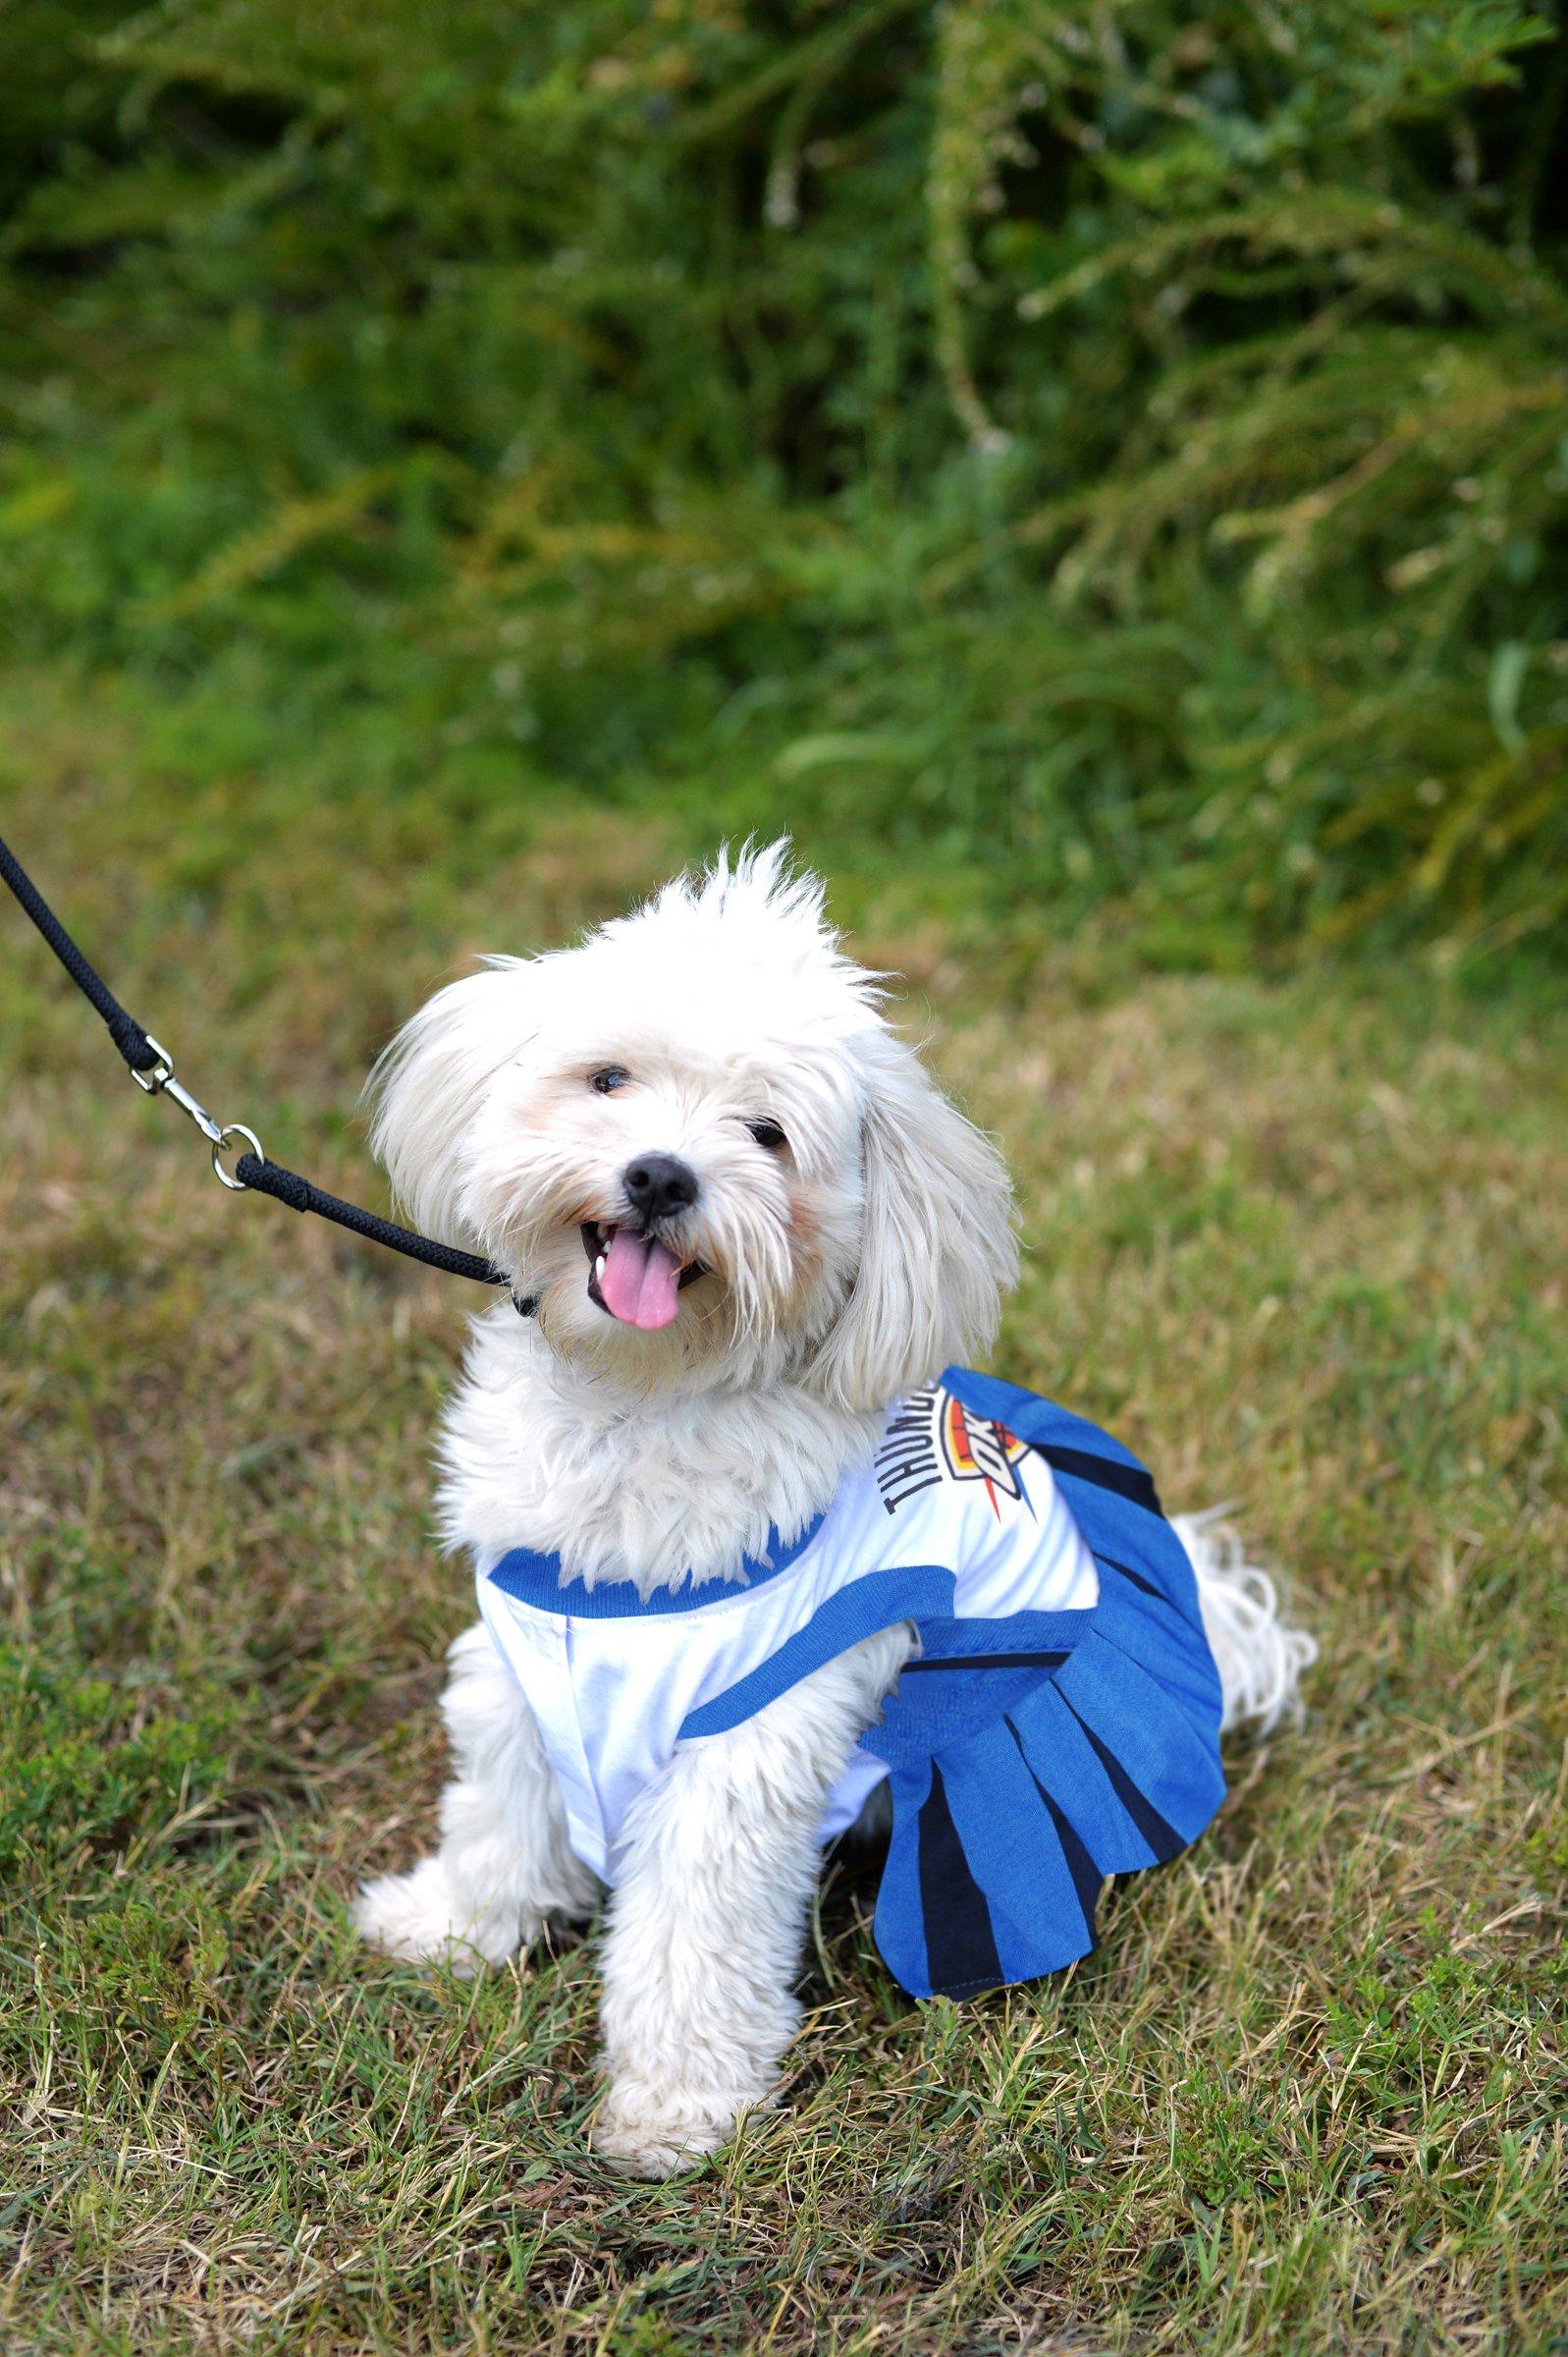 Pets First NBA Oklahoma City Thunder Dog Cheerleader Dress, Medium by Pets First (Image #3)